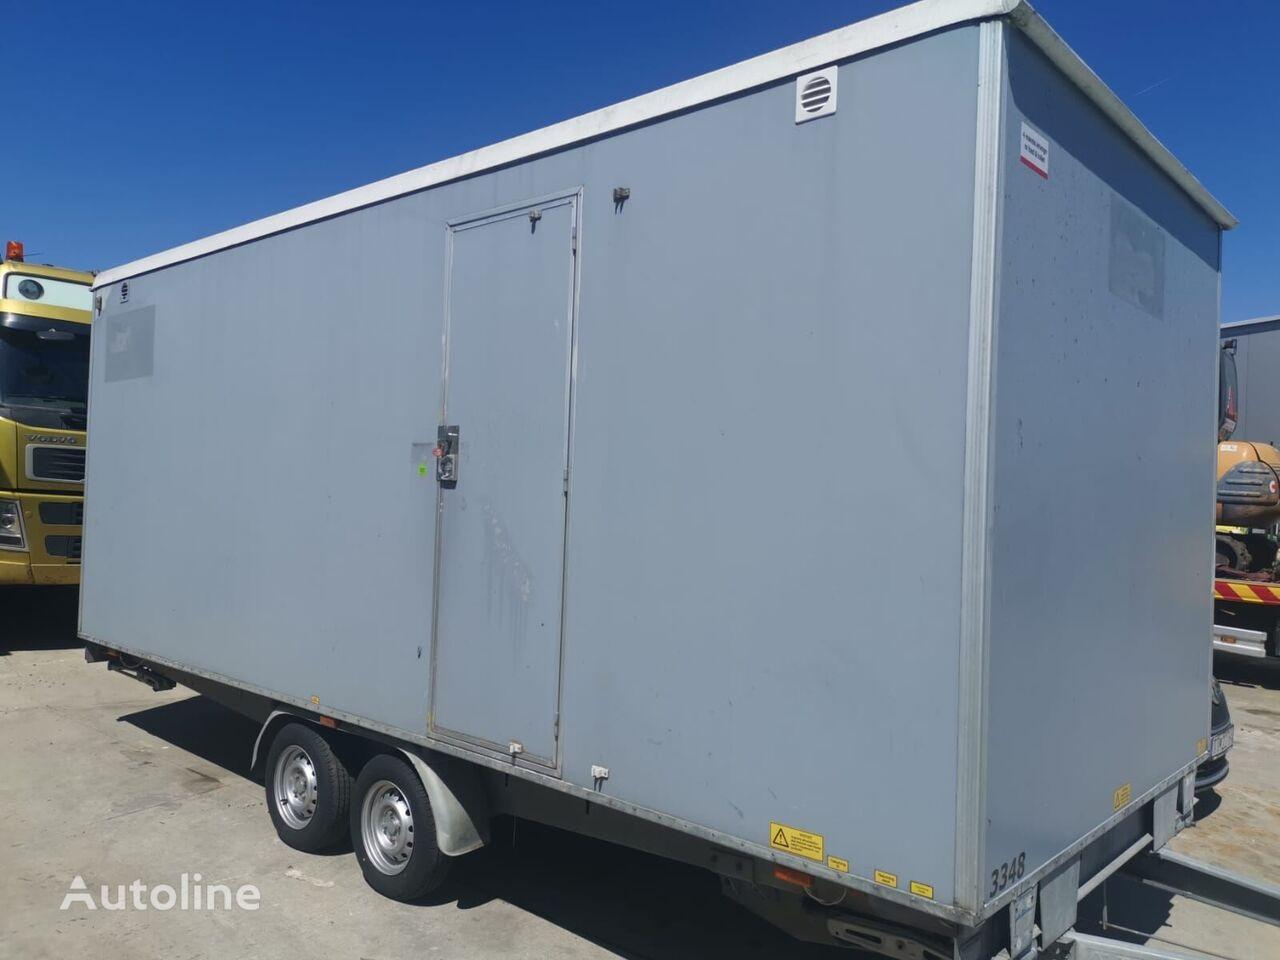 Scanvogn office trailer with showe, WC caravan trailer